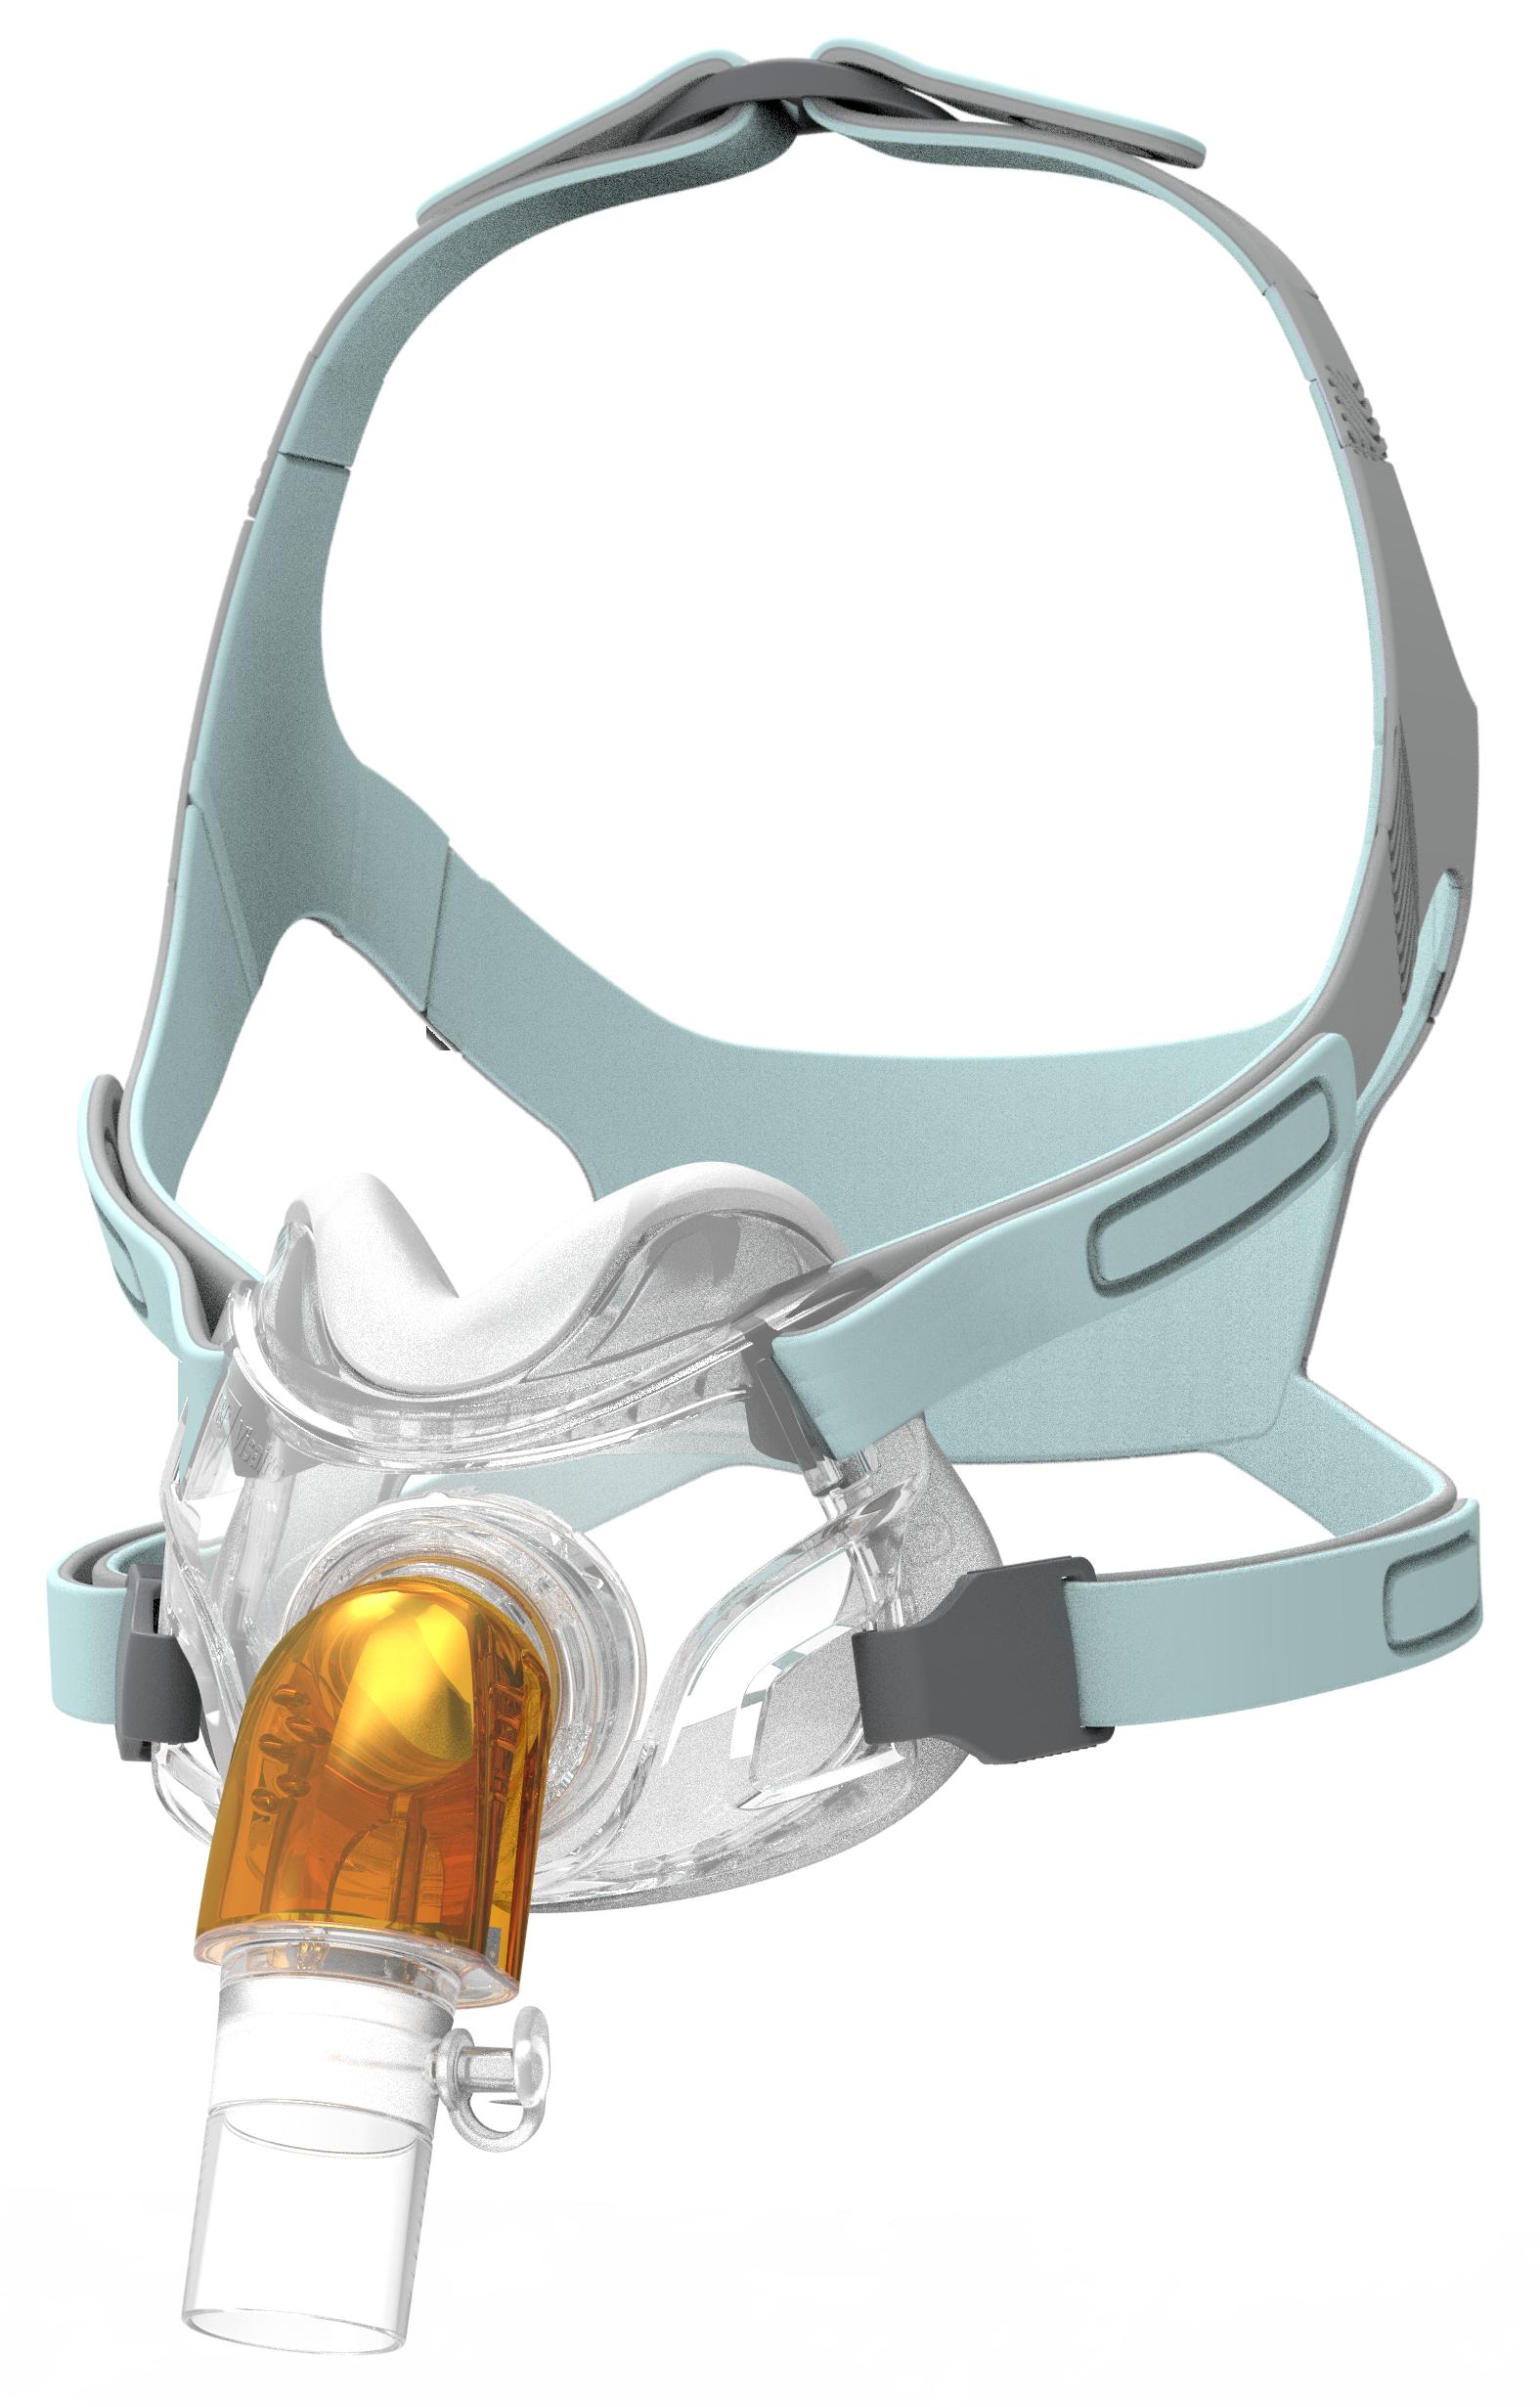 Visairo Hospital Under Nose Mask. Vented, anti-asphyxiation valve version